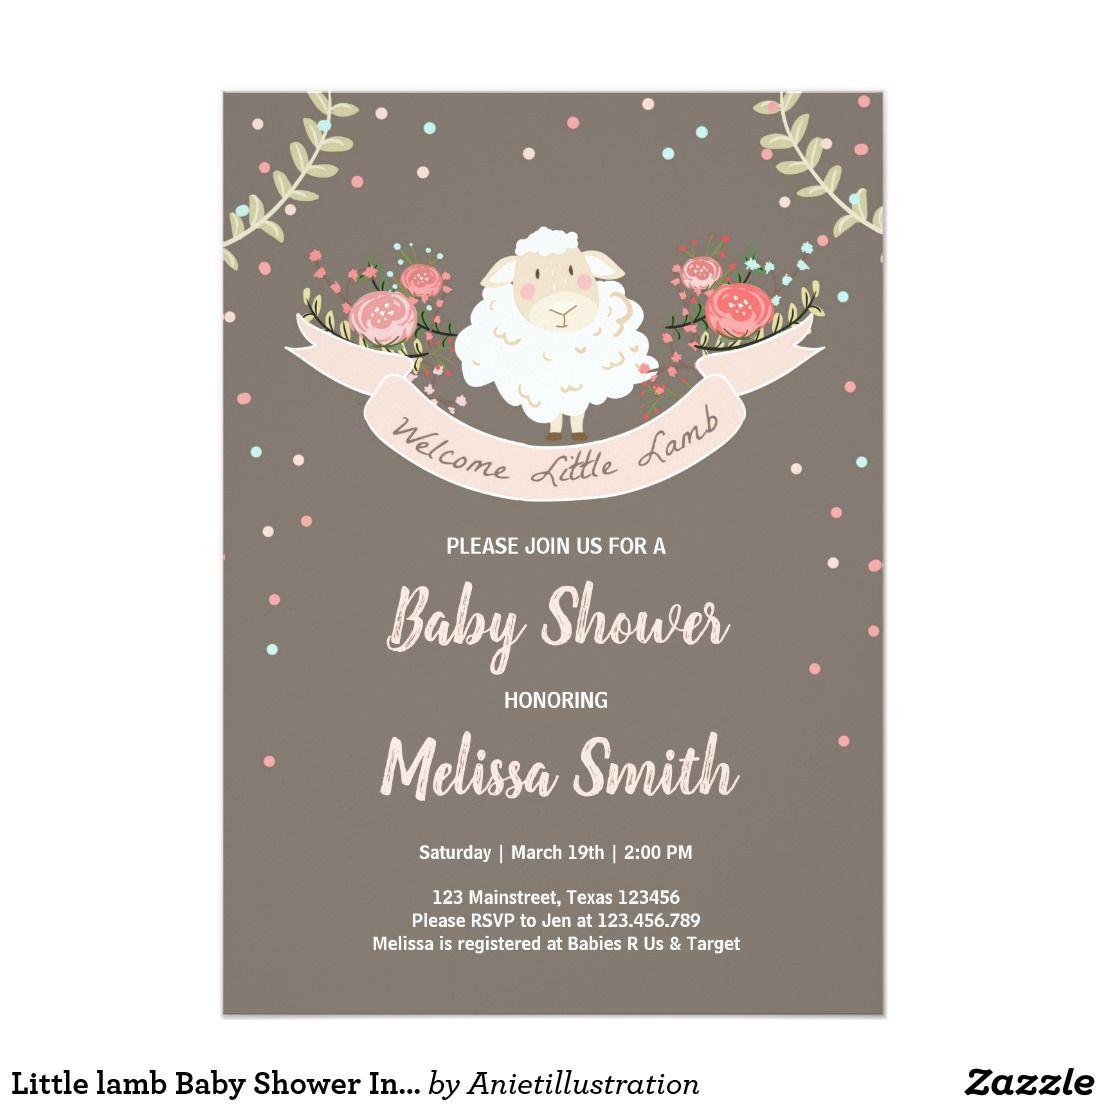 Little lamb Baby Shower Invitation Pink Spring | Baby Shower - Aniet ...